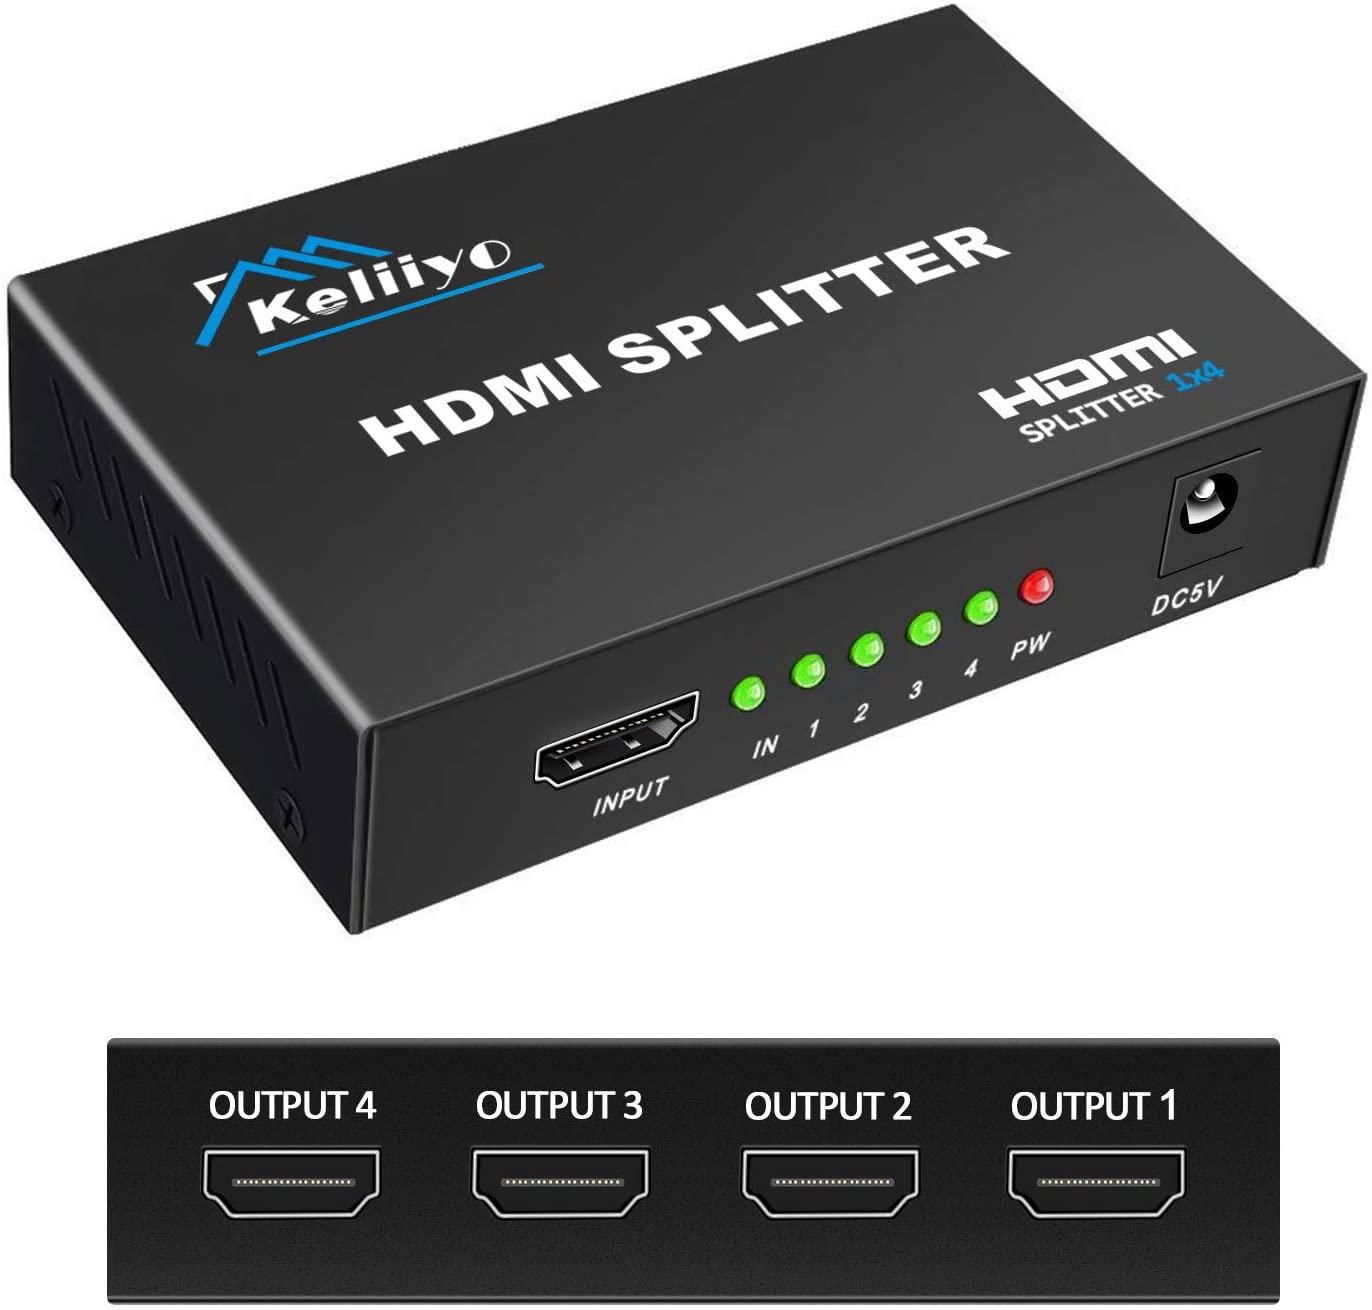 Keliiyo HDMI Splitter